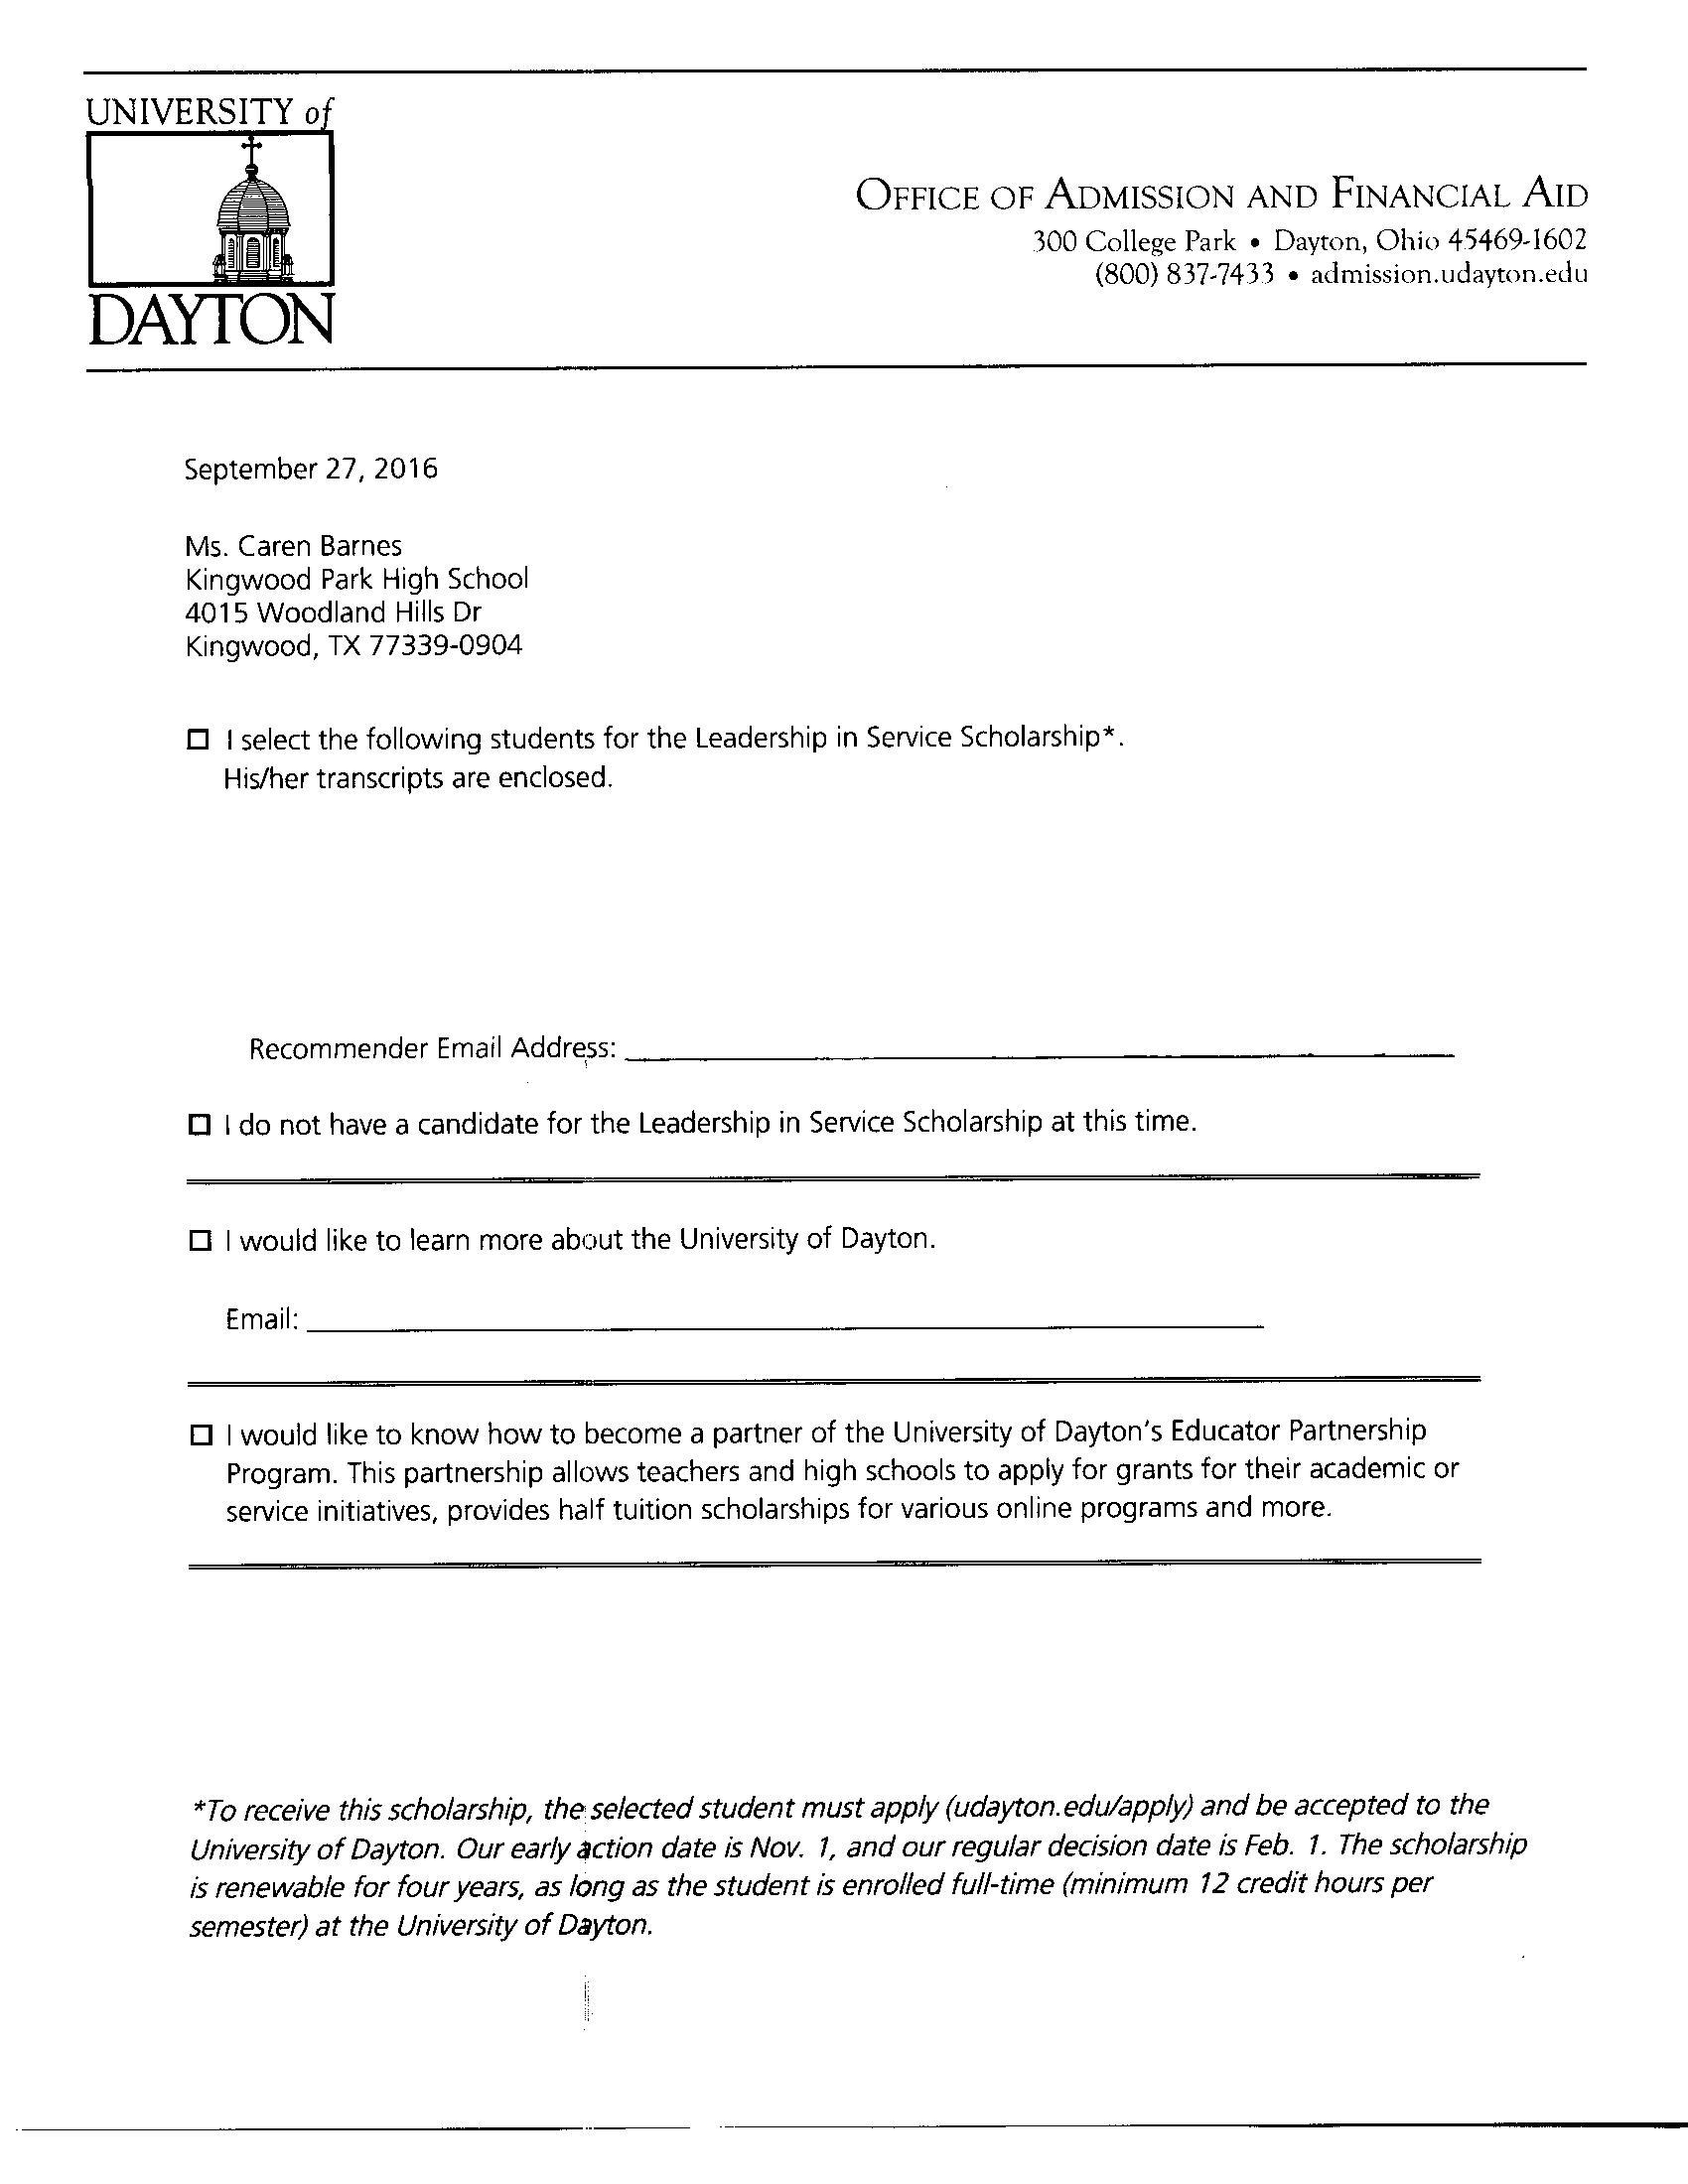 015 Gates Millenium Scholarship Essays Dayton Essay Staggering Millennium Questions Full